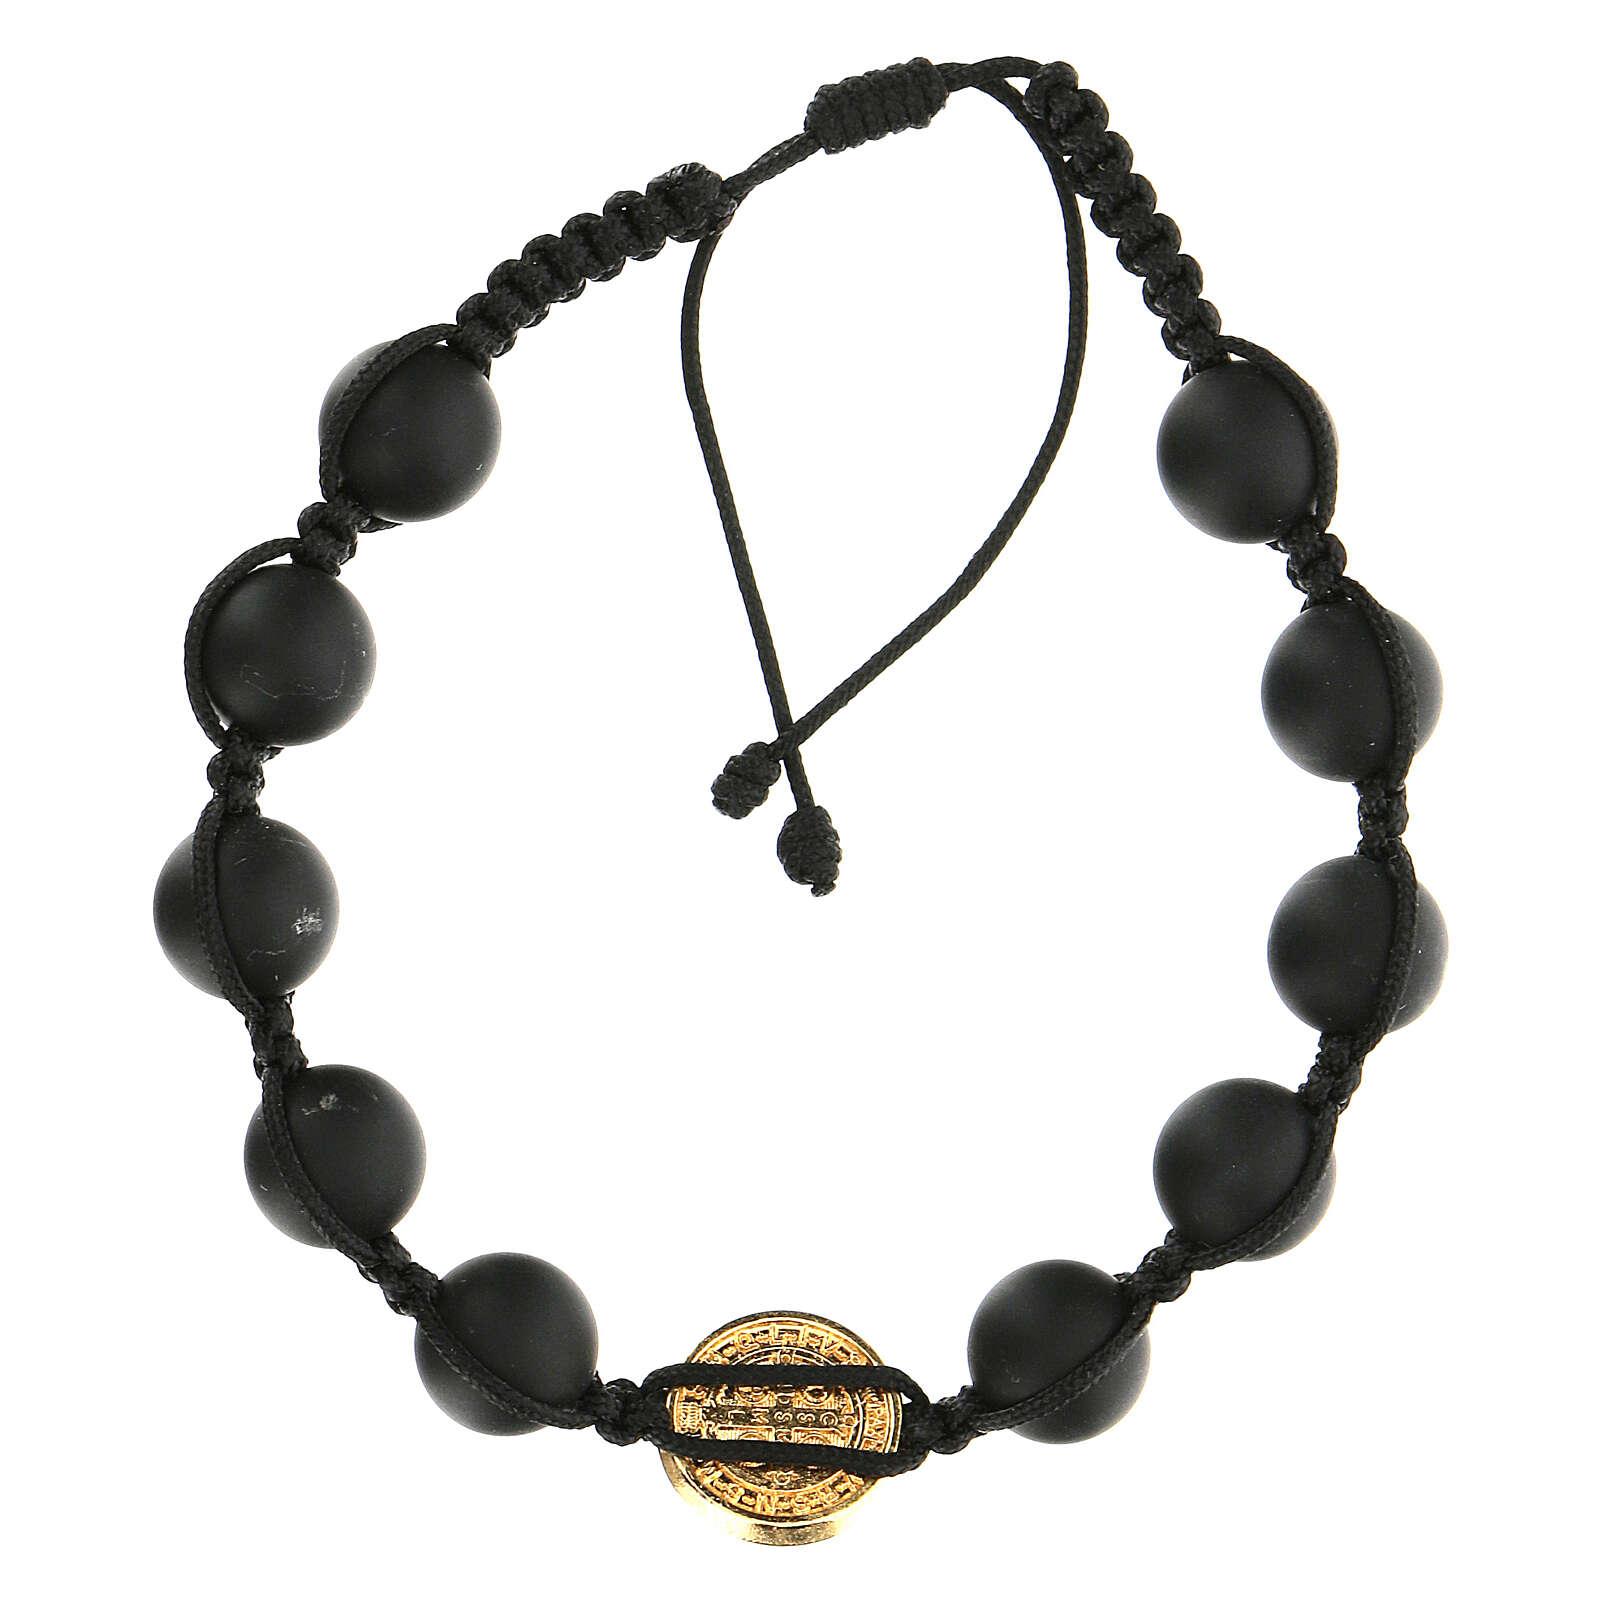 Pulsera Medjugorje granos negros piedra pulida San Benito oro 4